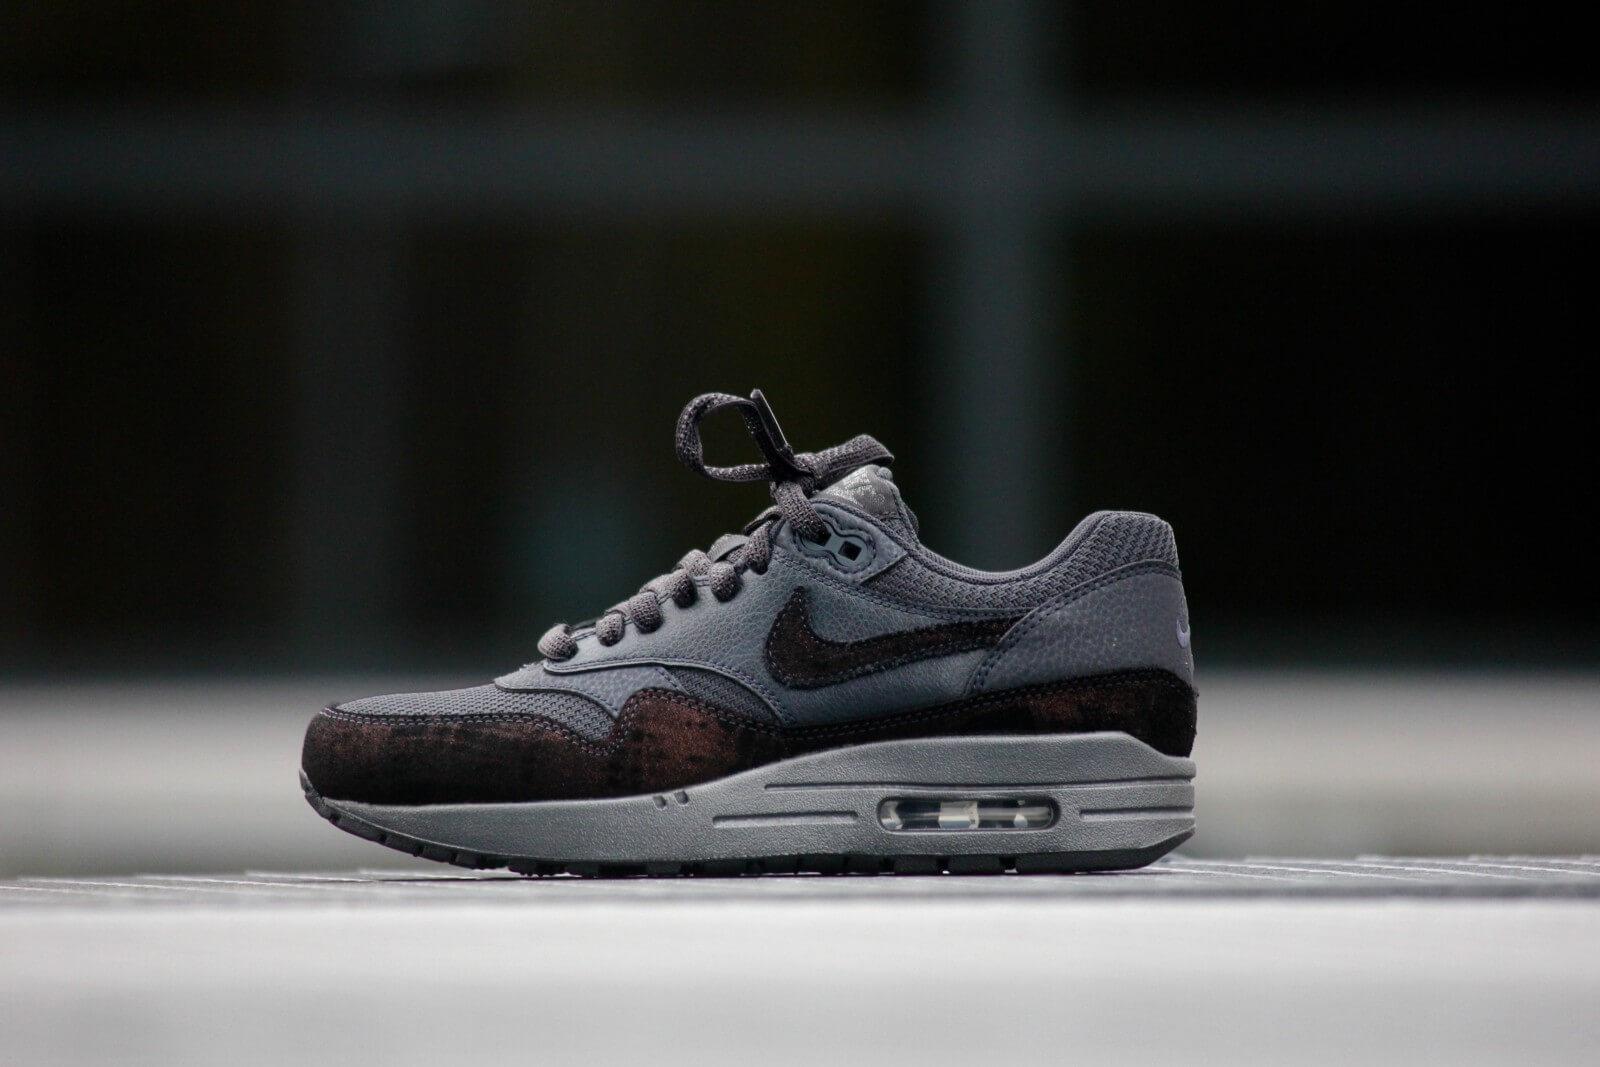 Nike Wmns Air Max 1 PRM Anthracite Black 454746 007